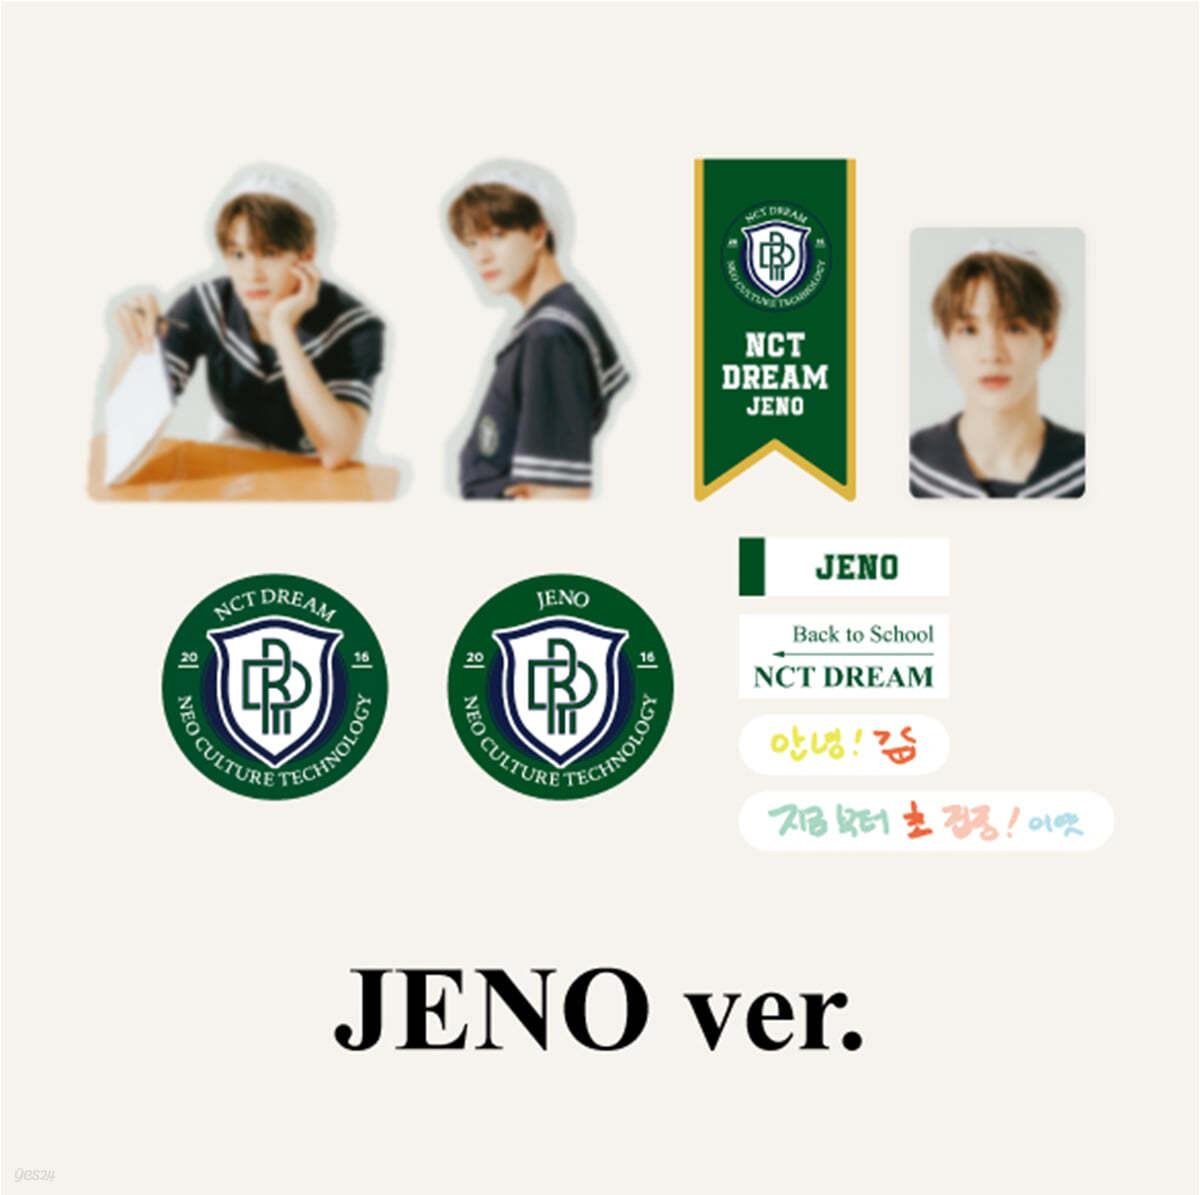 [NCT DREAM_JENO] 2021 BSK LUGGAGE STICKER+PHOTO CARD SET